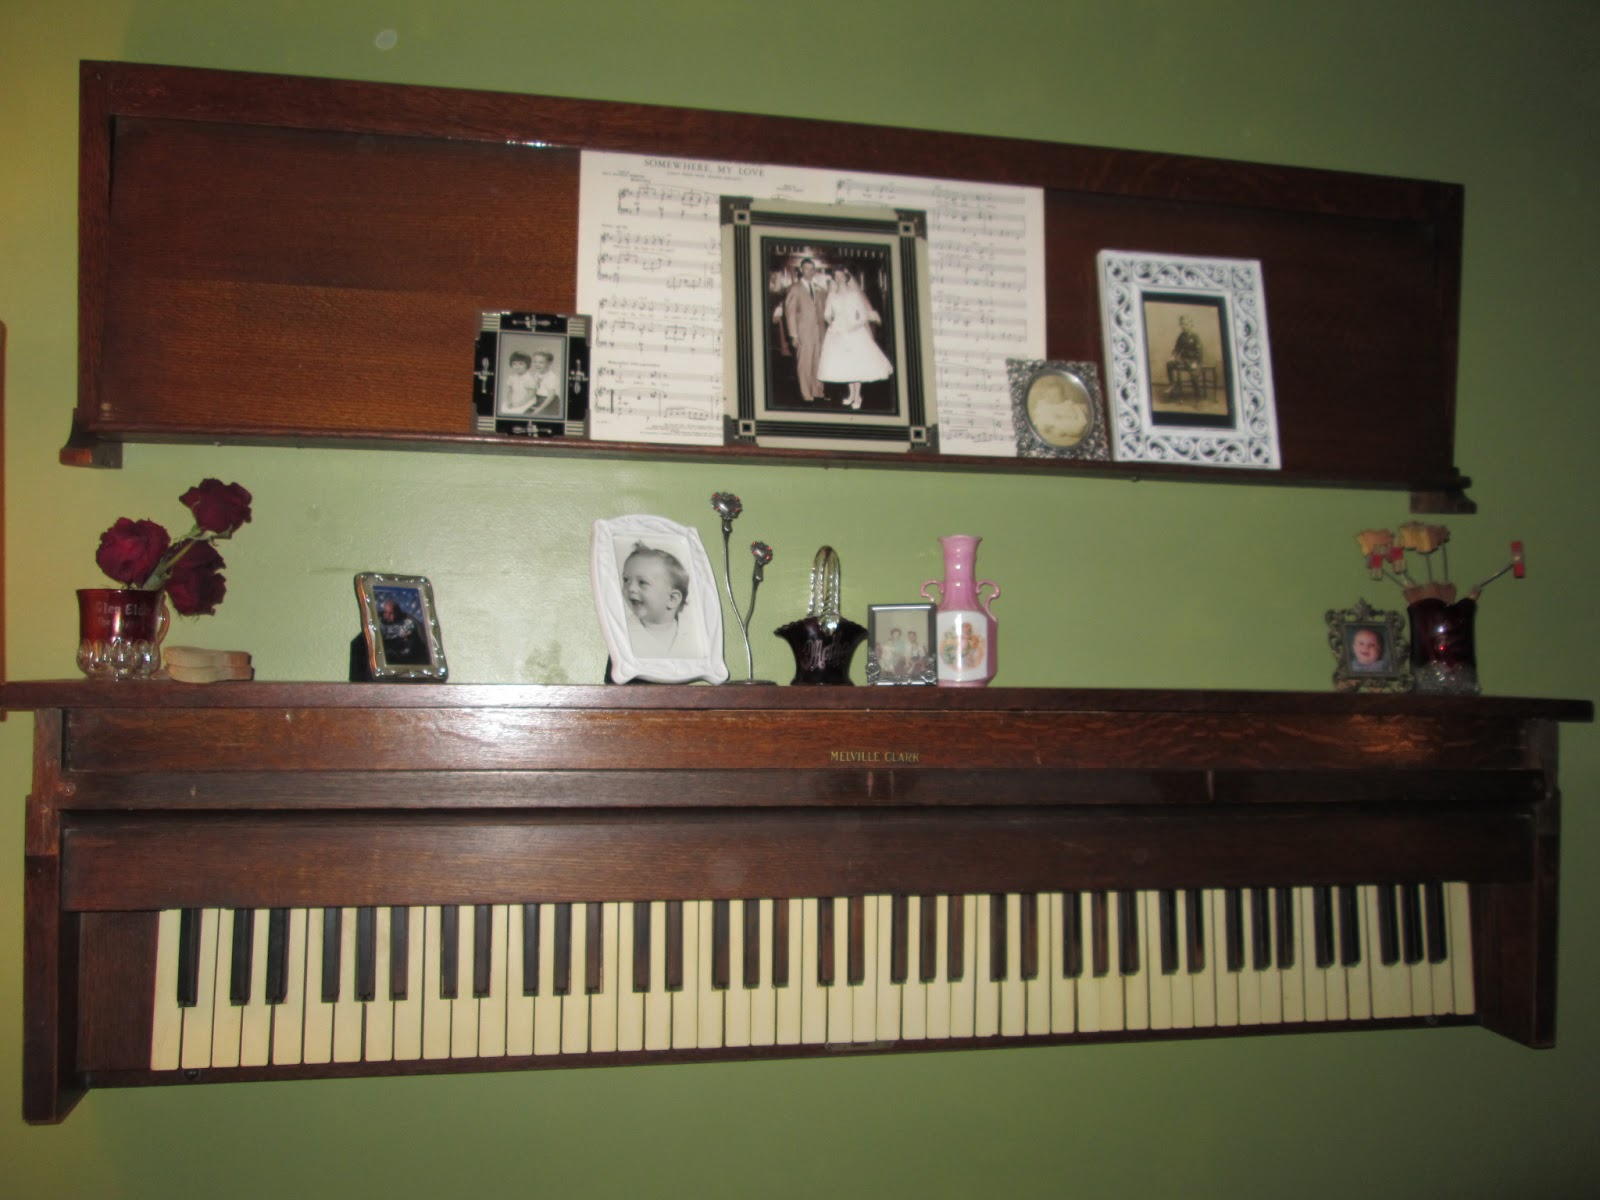 Decor, Recycle Piano, Music Ideas, Piano Ideas ...